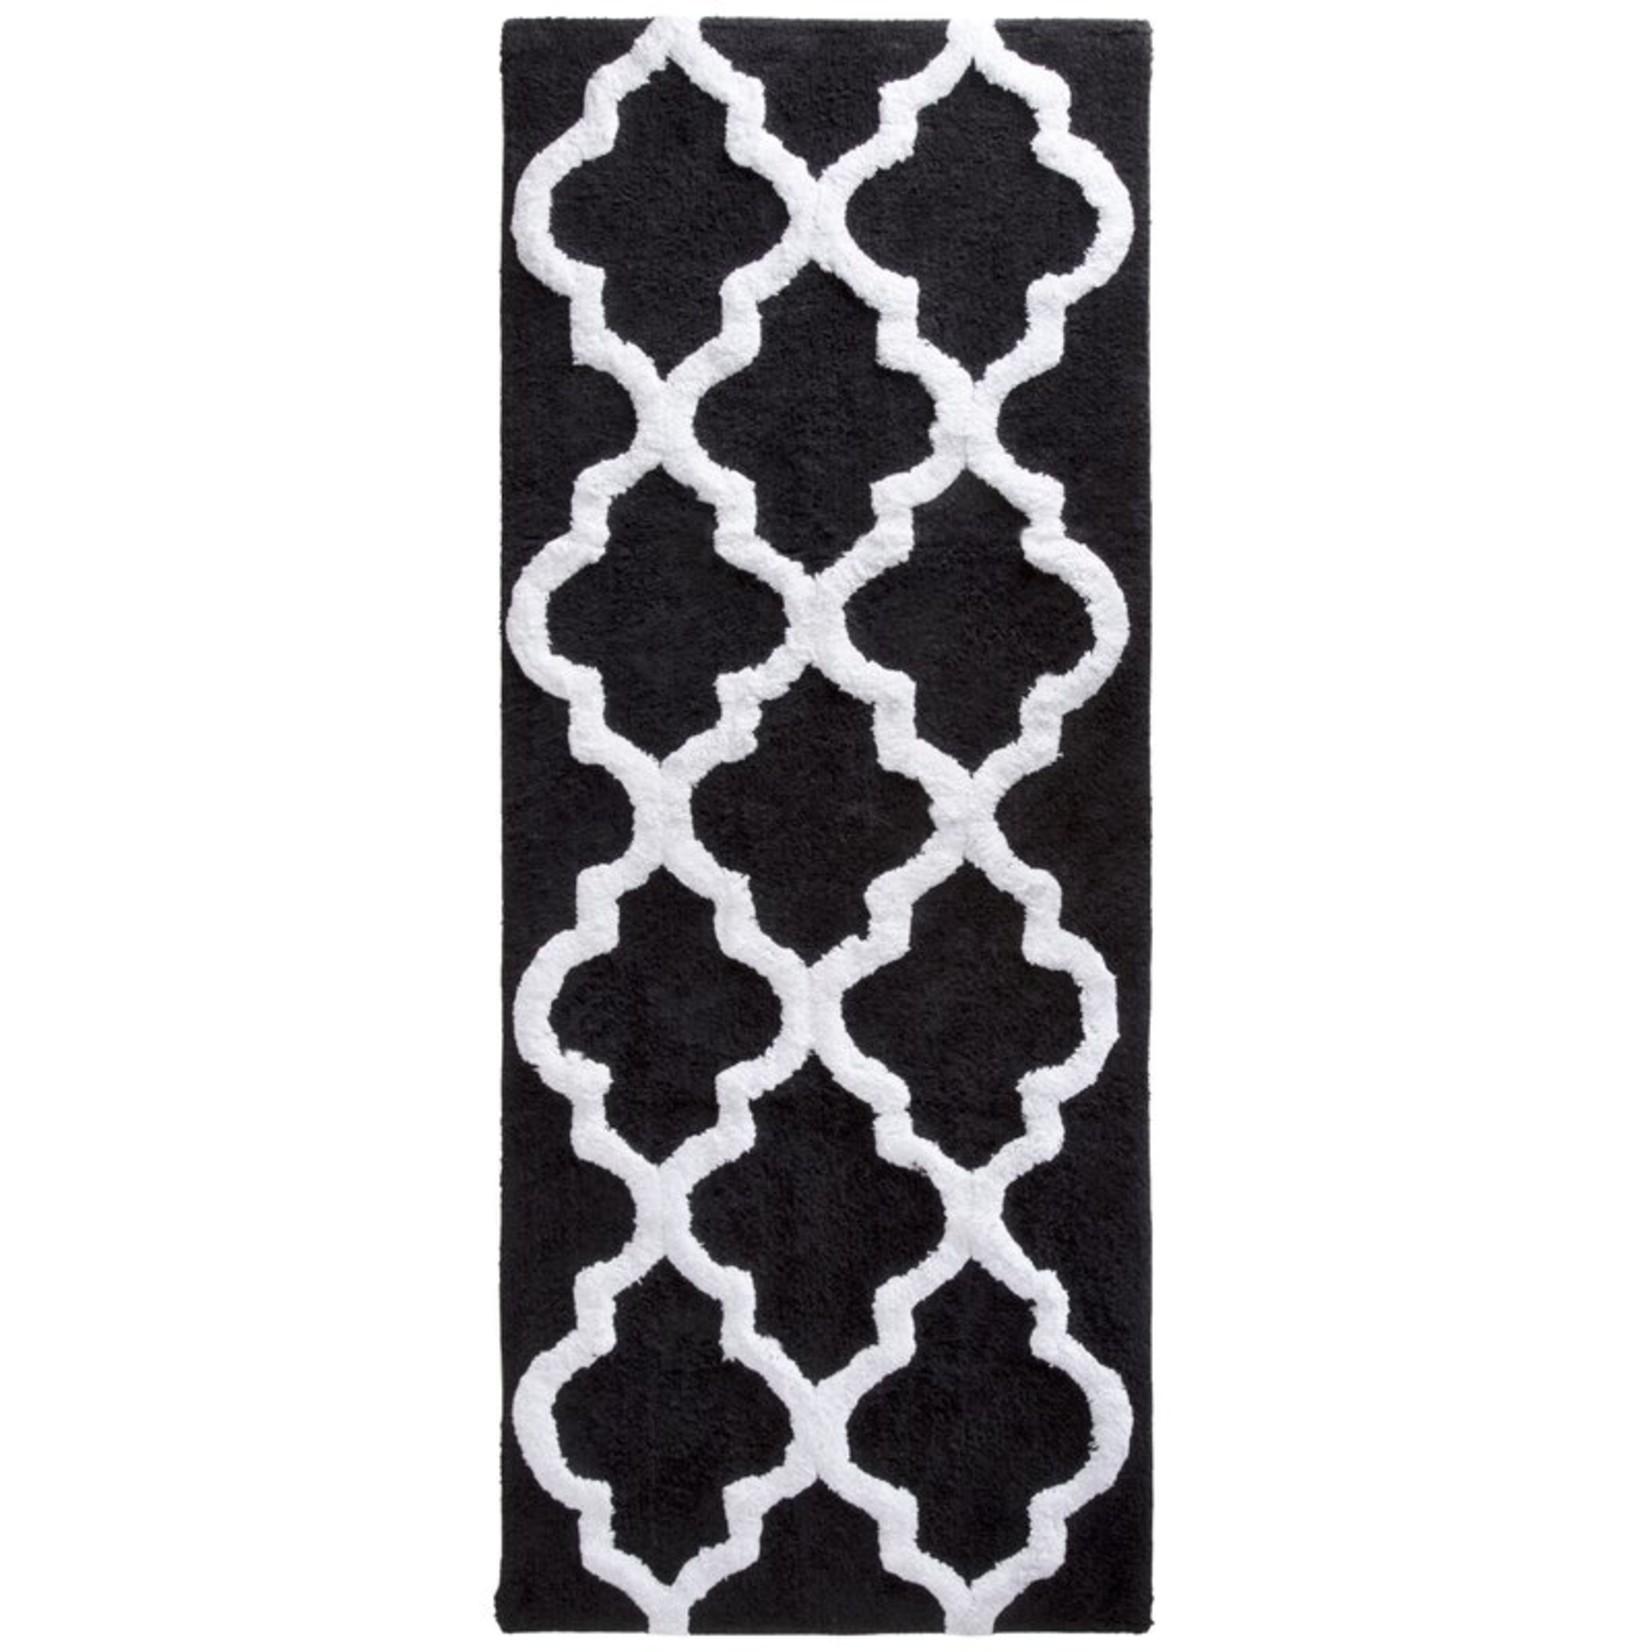 *Long Trellis Rectangular 100% Cotton Non-Slip Geometric Bath Rug